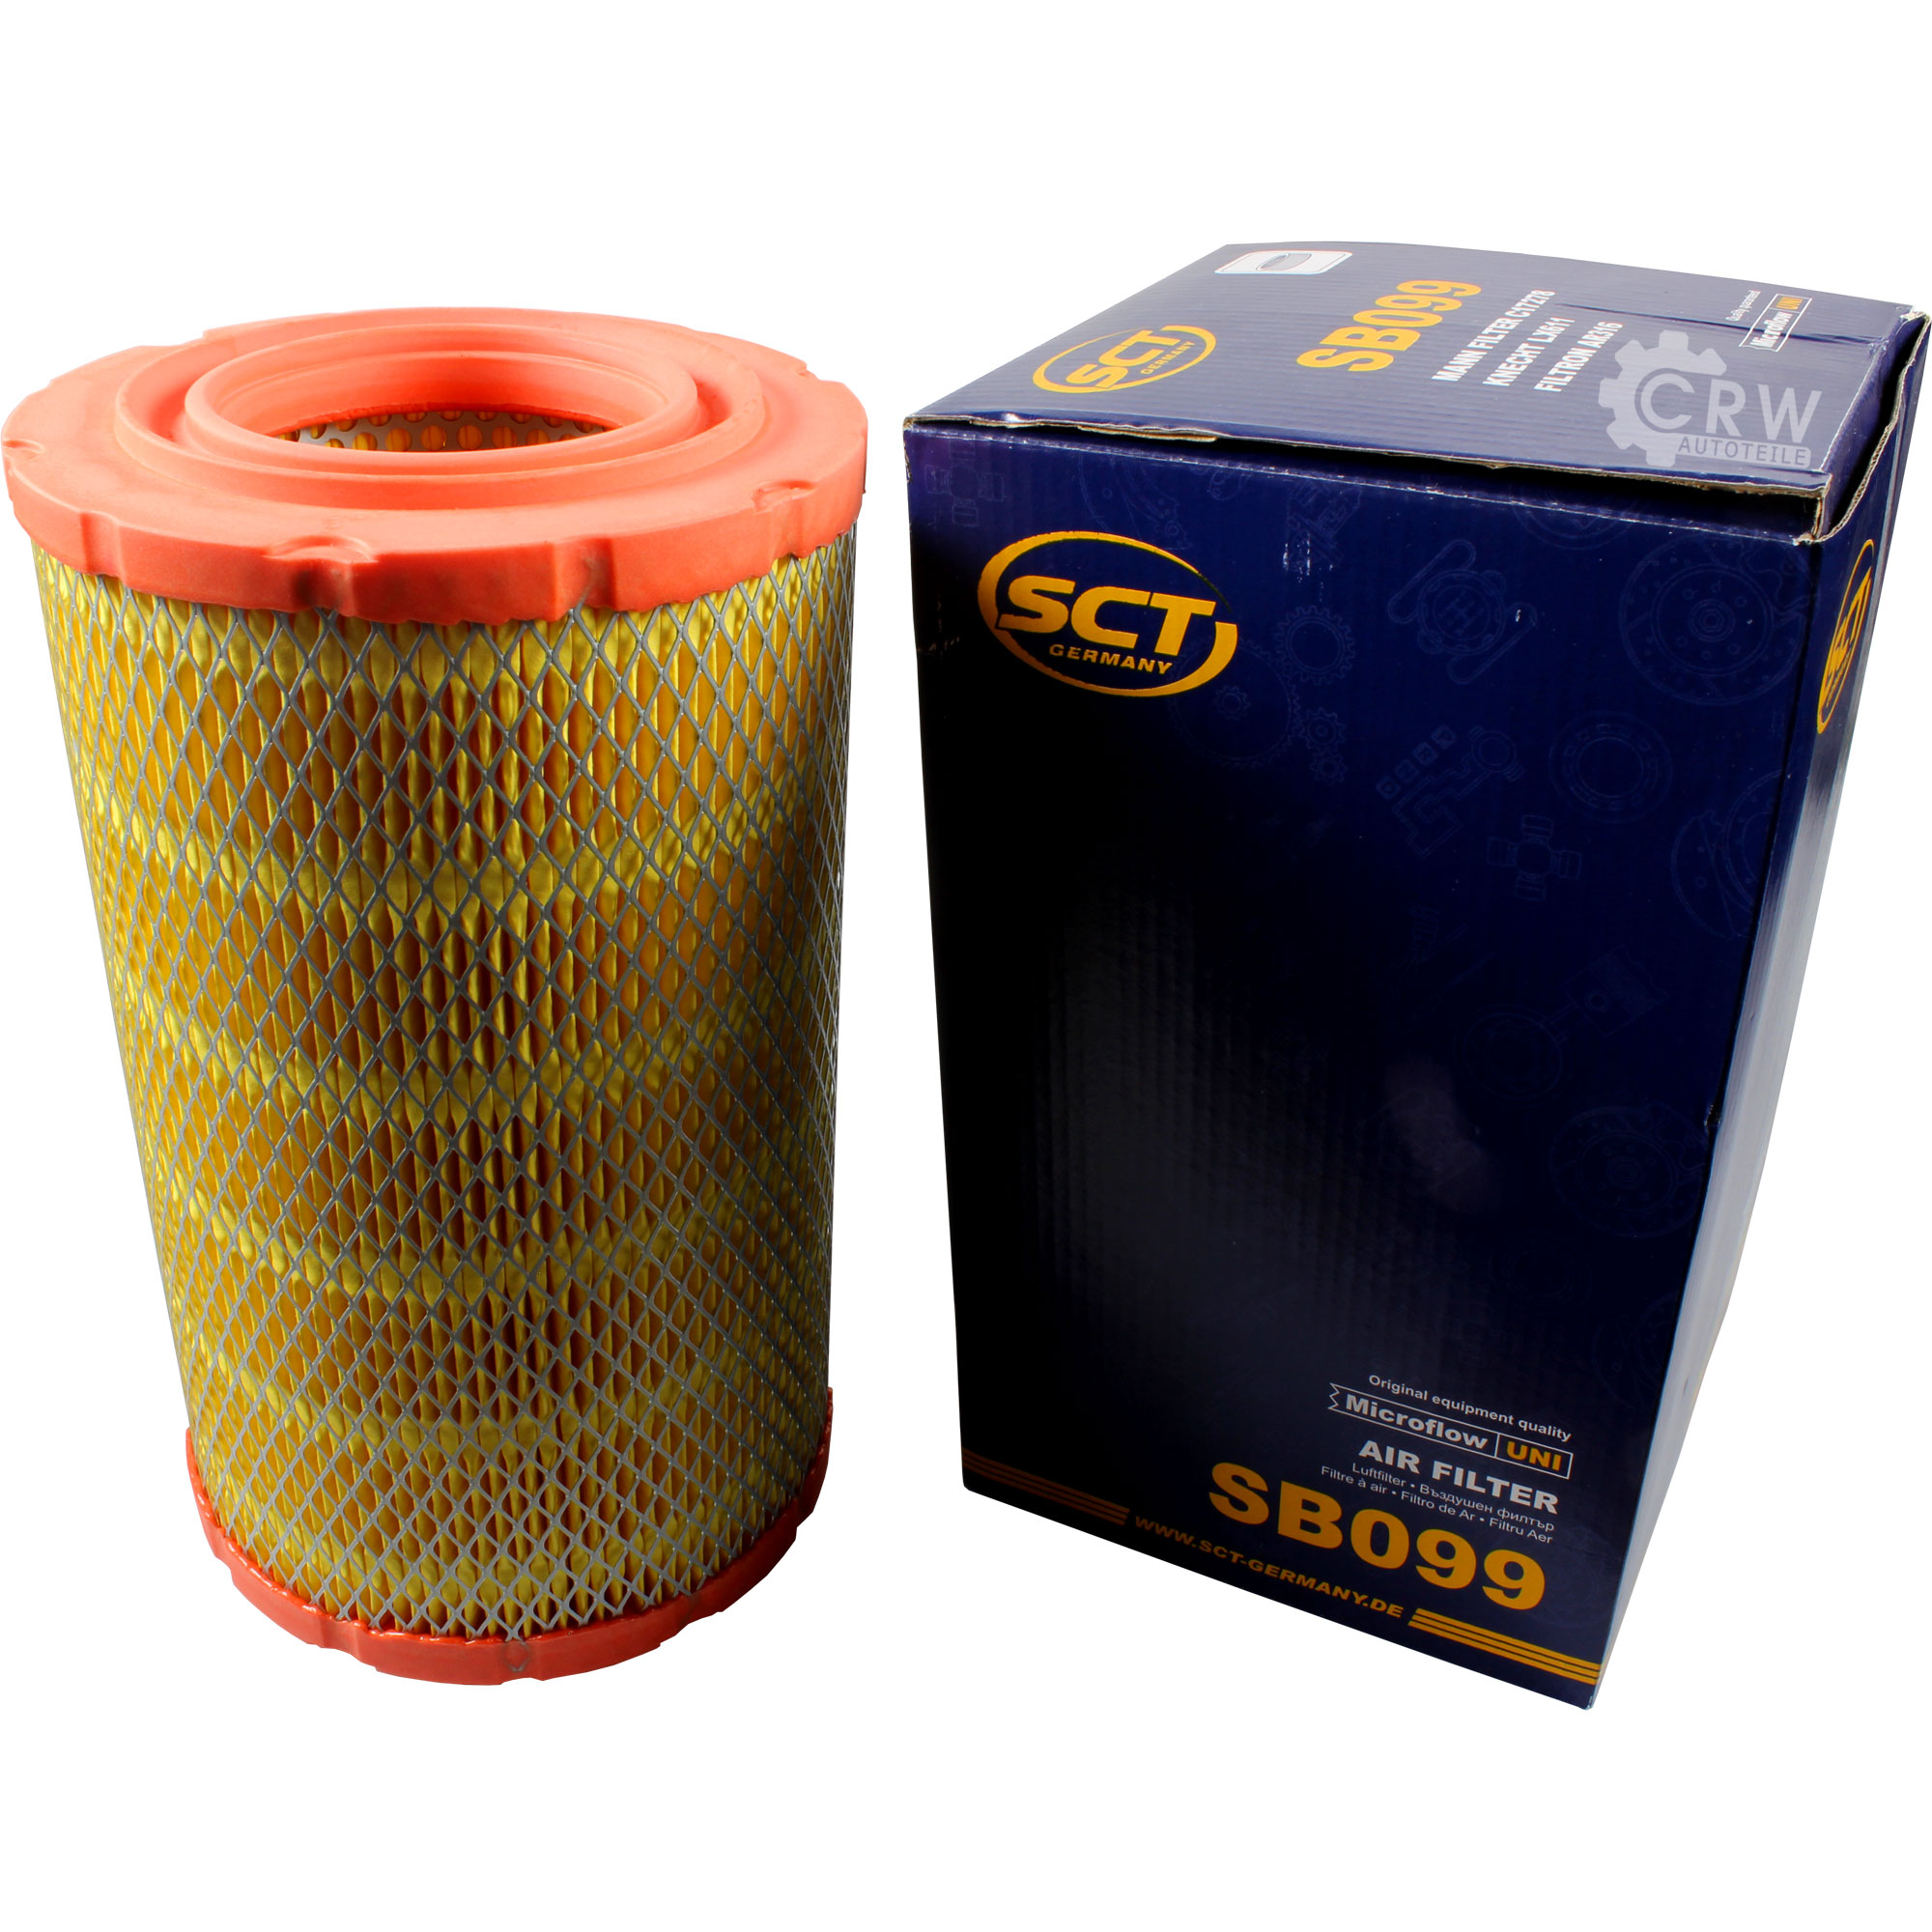 Olwechsel-Set-7L-MANNOL-Extreme-5W-40-Motoroel-SCT-Filter-KIT-10196475 Indexbild 4